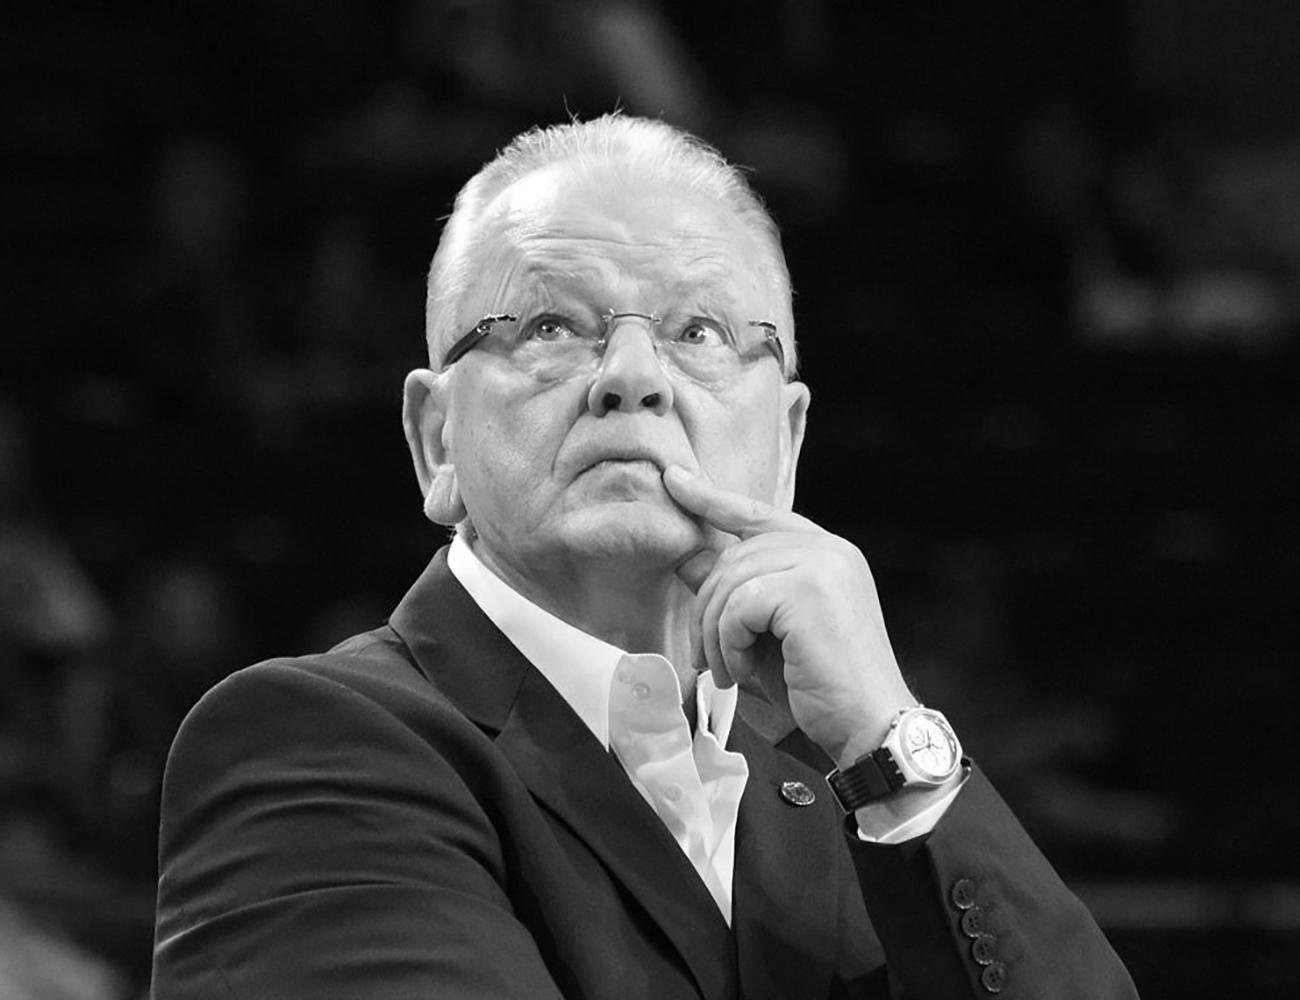 Dusan Ivkovic has passed away